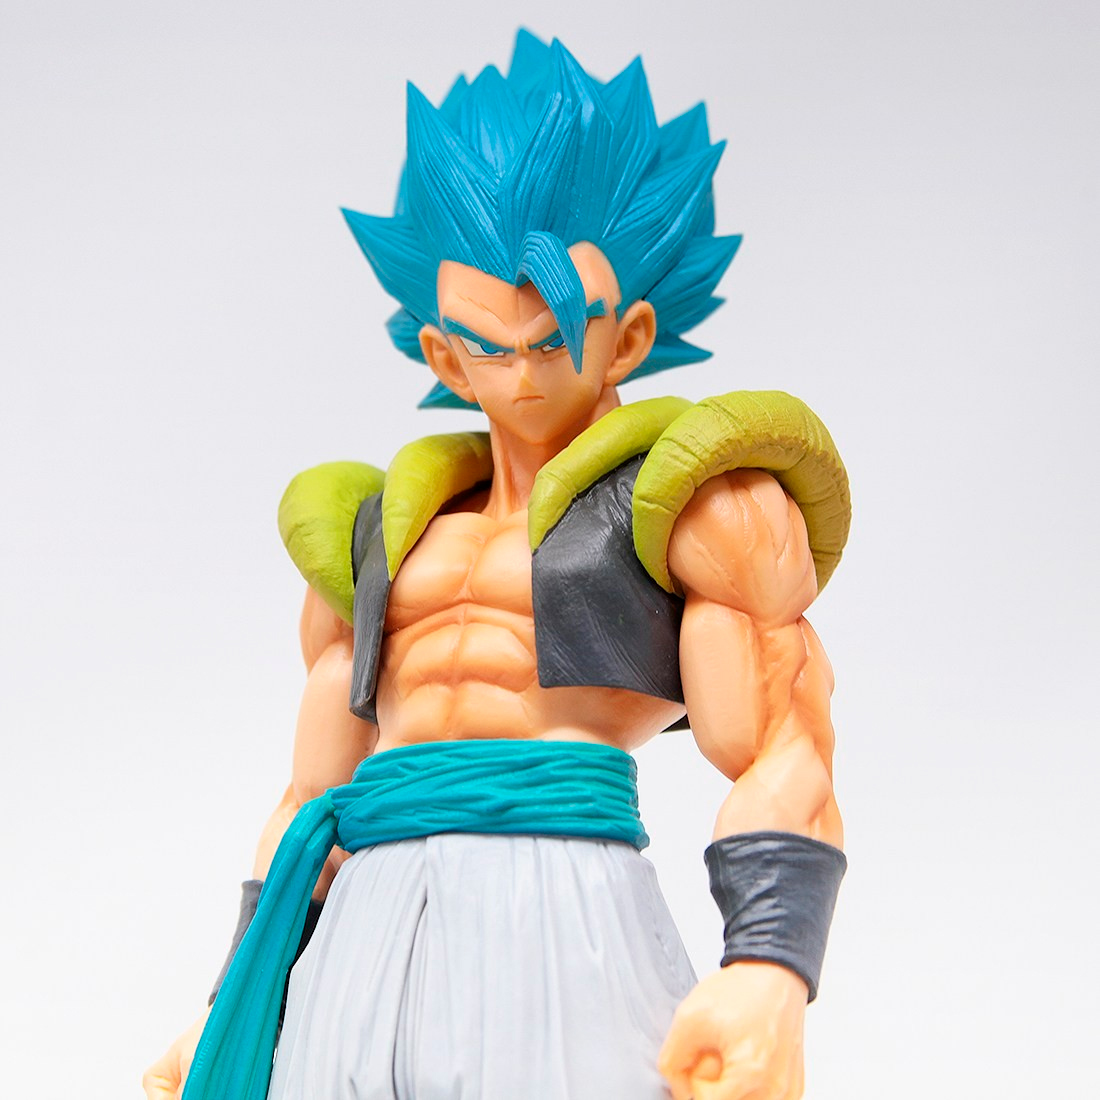 Banpresto The Movie Dragon Ball Super Broly Super Master Stars Piece The Gogeta The Brush Super Saiyan Blue